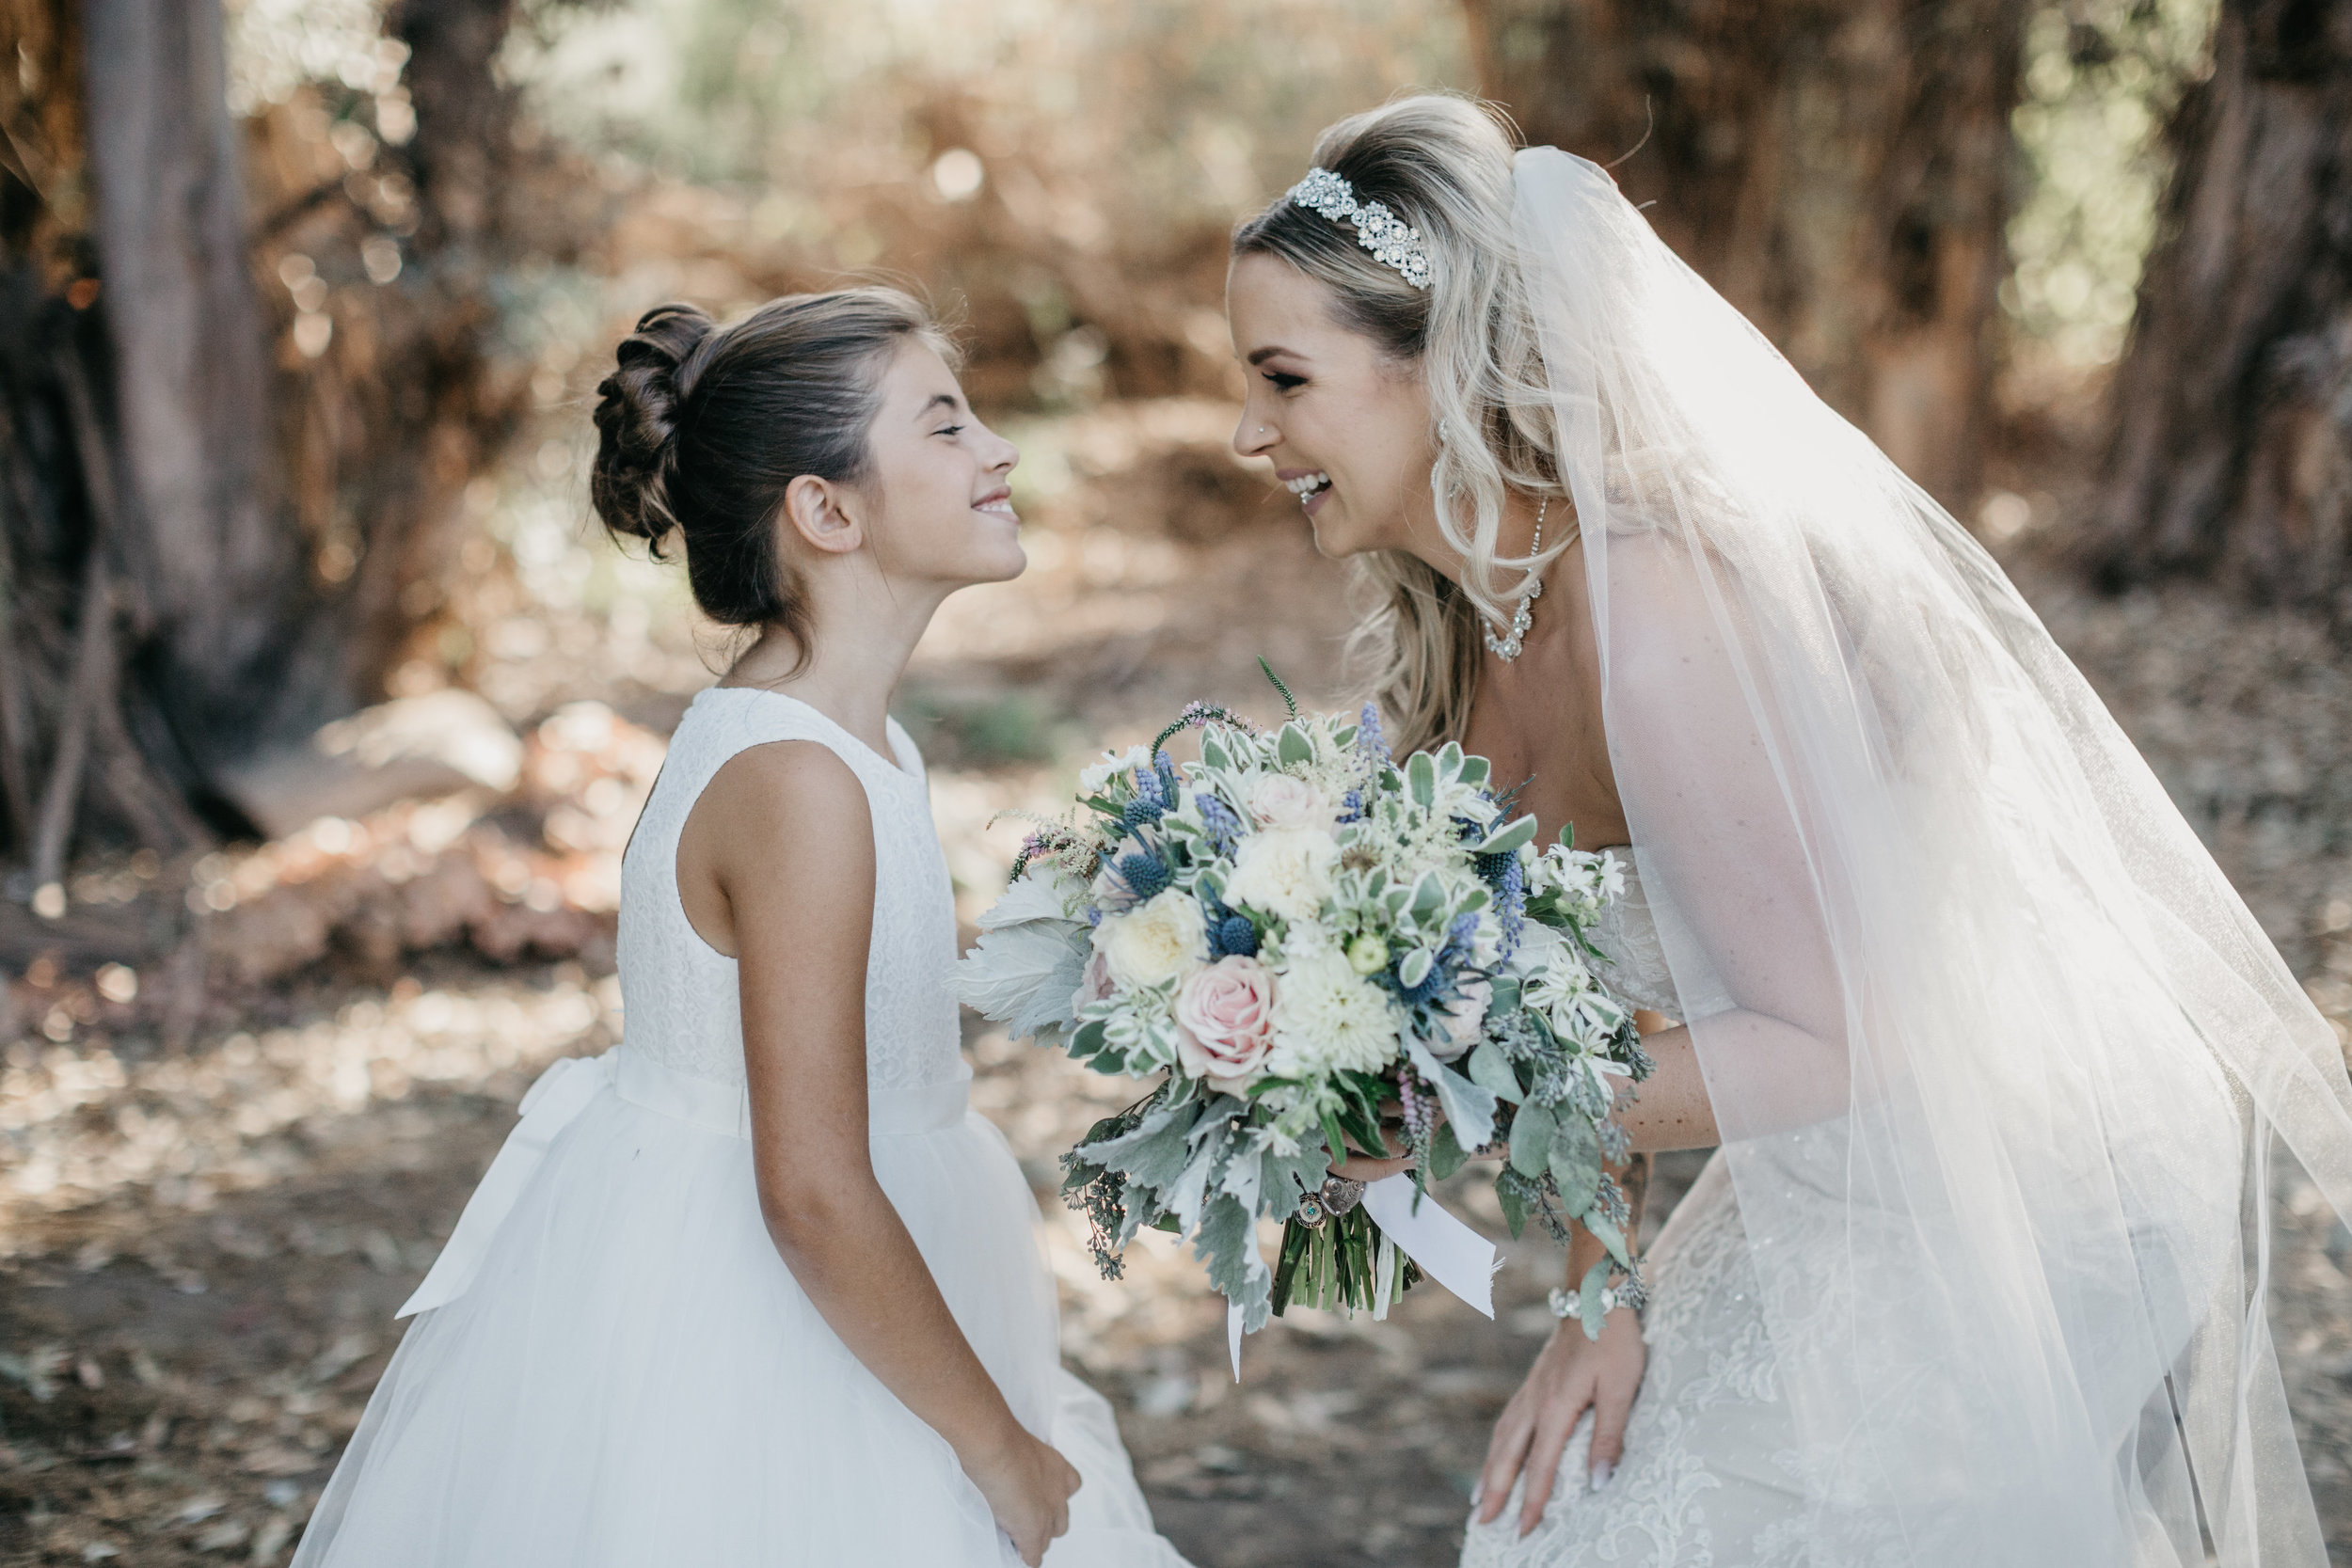 DianaLakePhoto-L+M-San-Diego-Wedding-Bridesmaids91.jpg